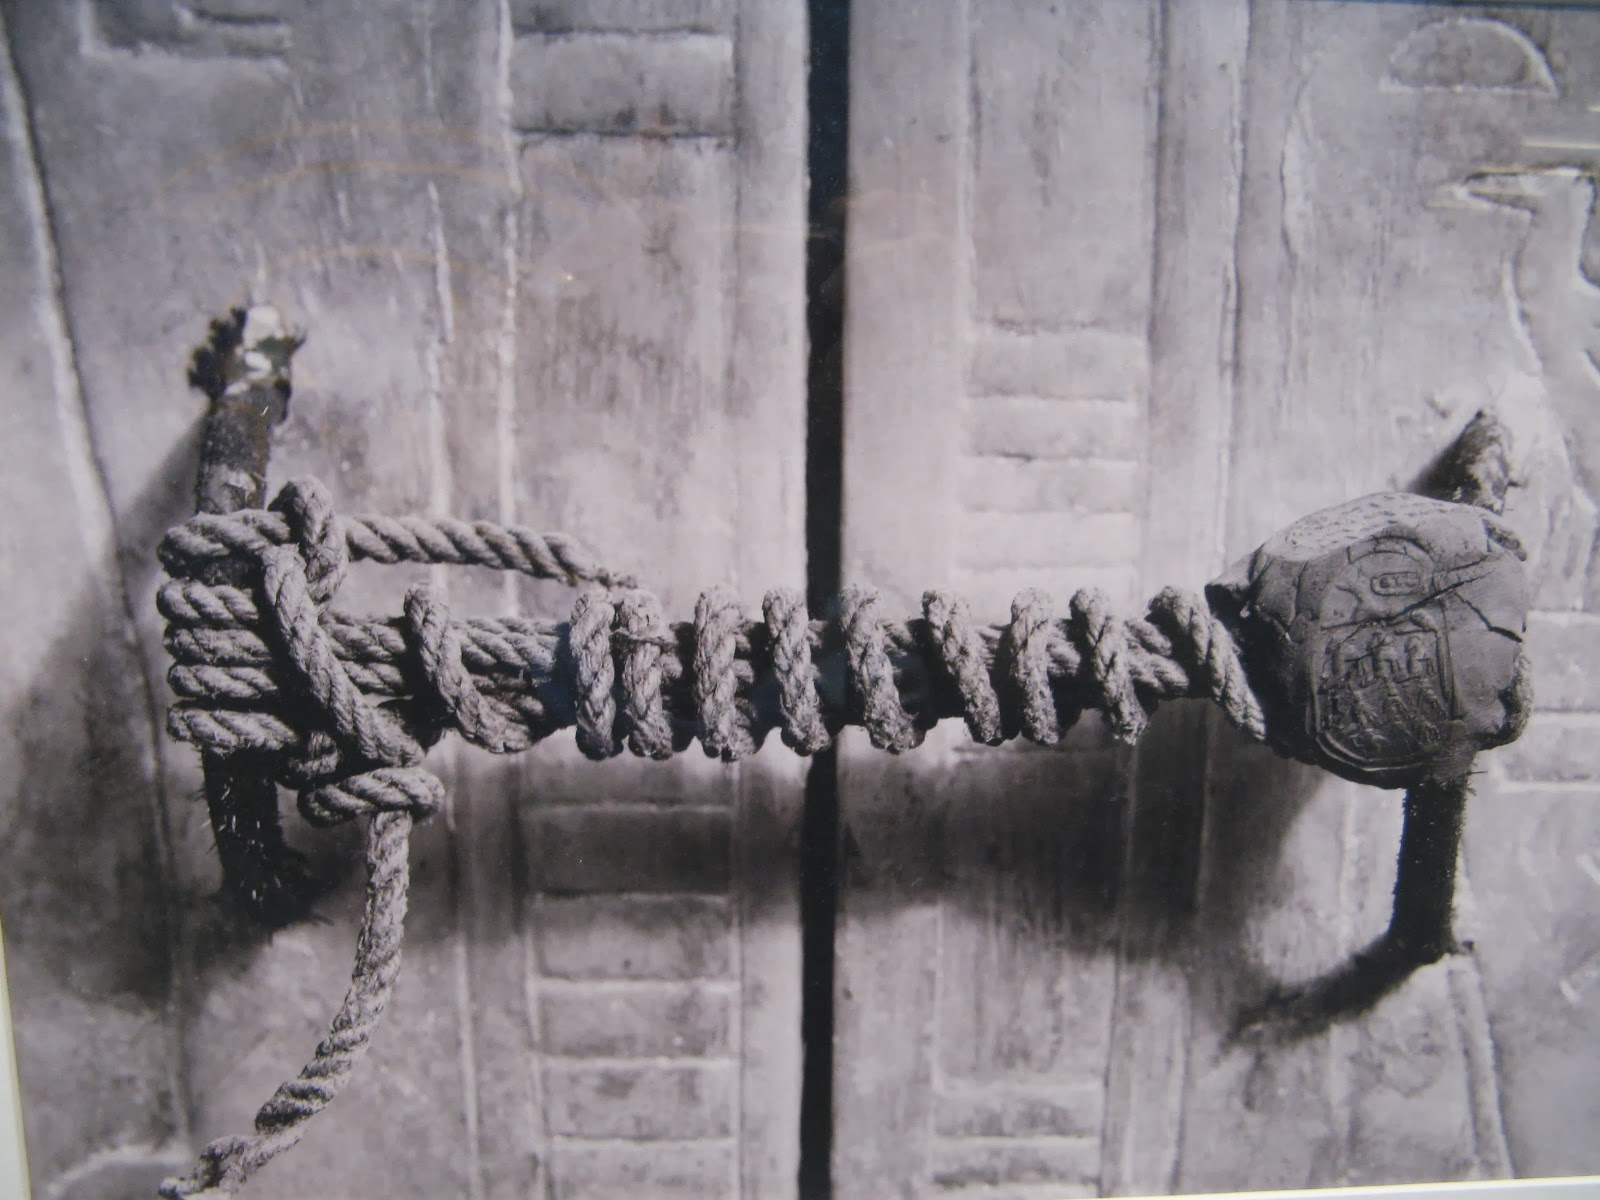 1922: opening of the tomb of Tutankhamen